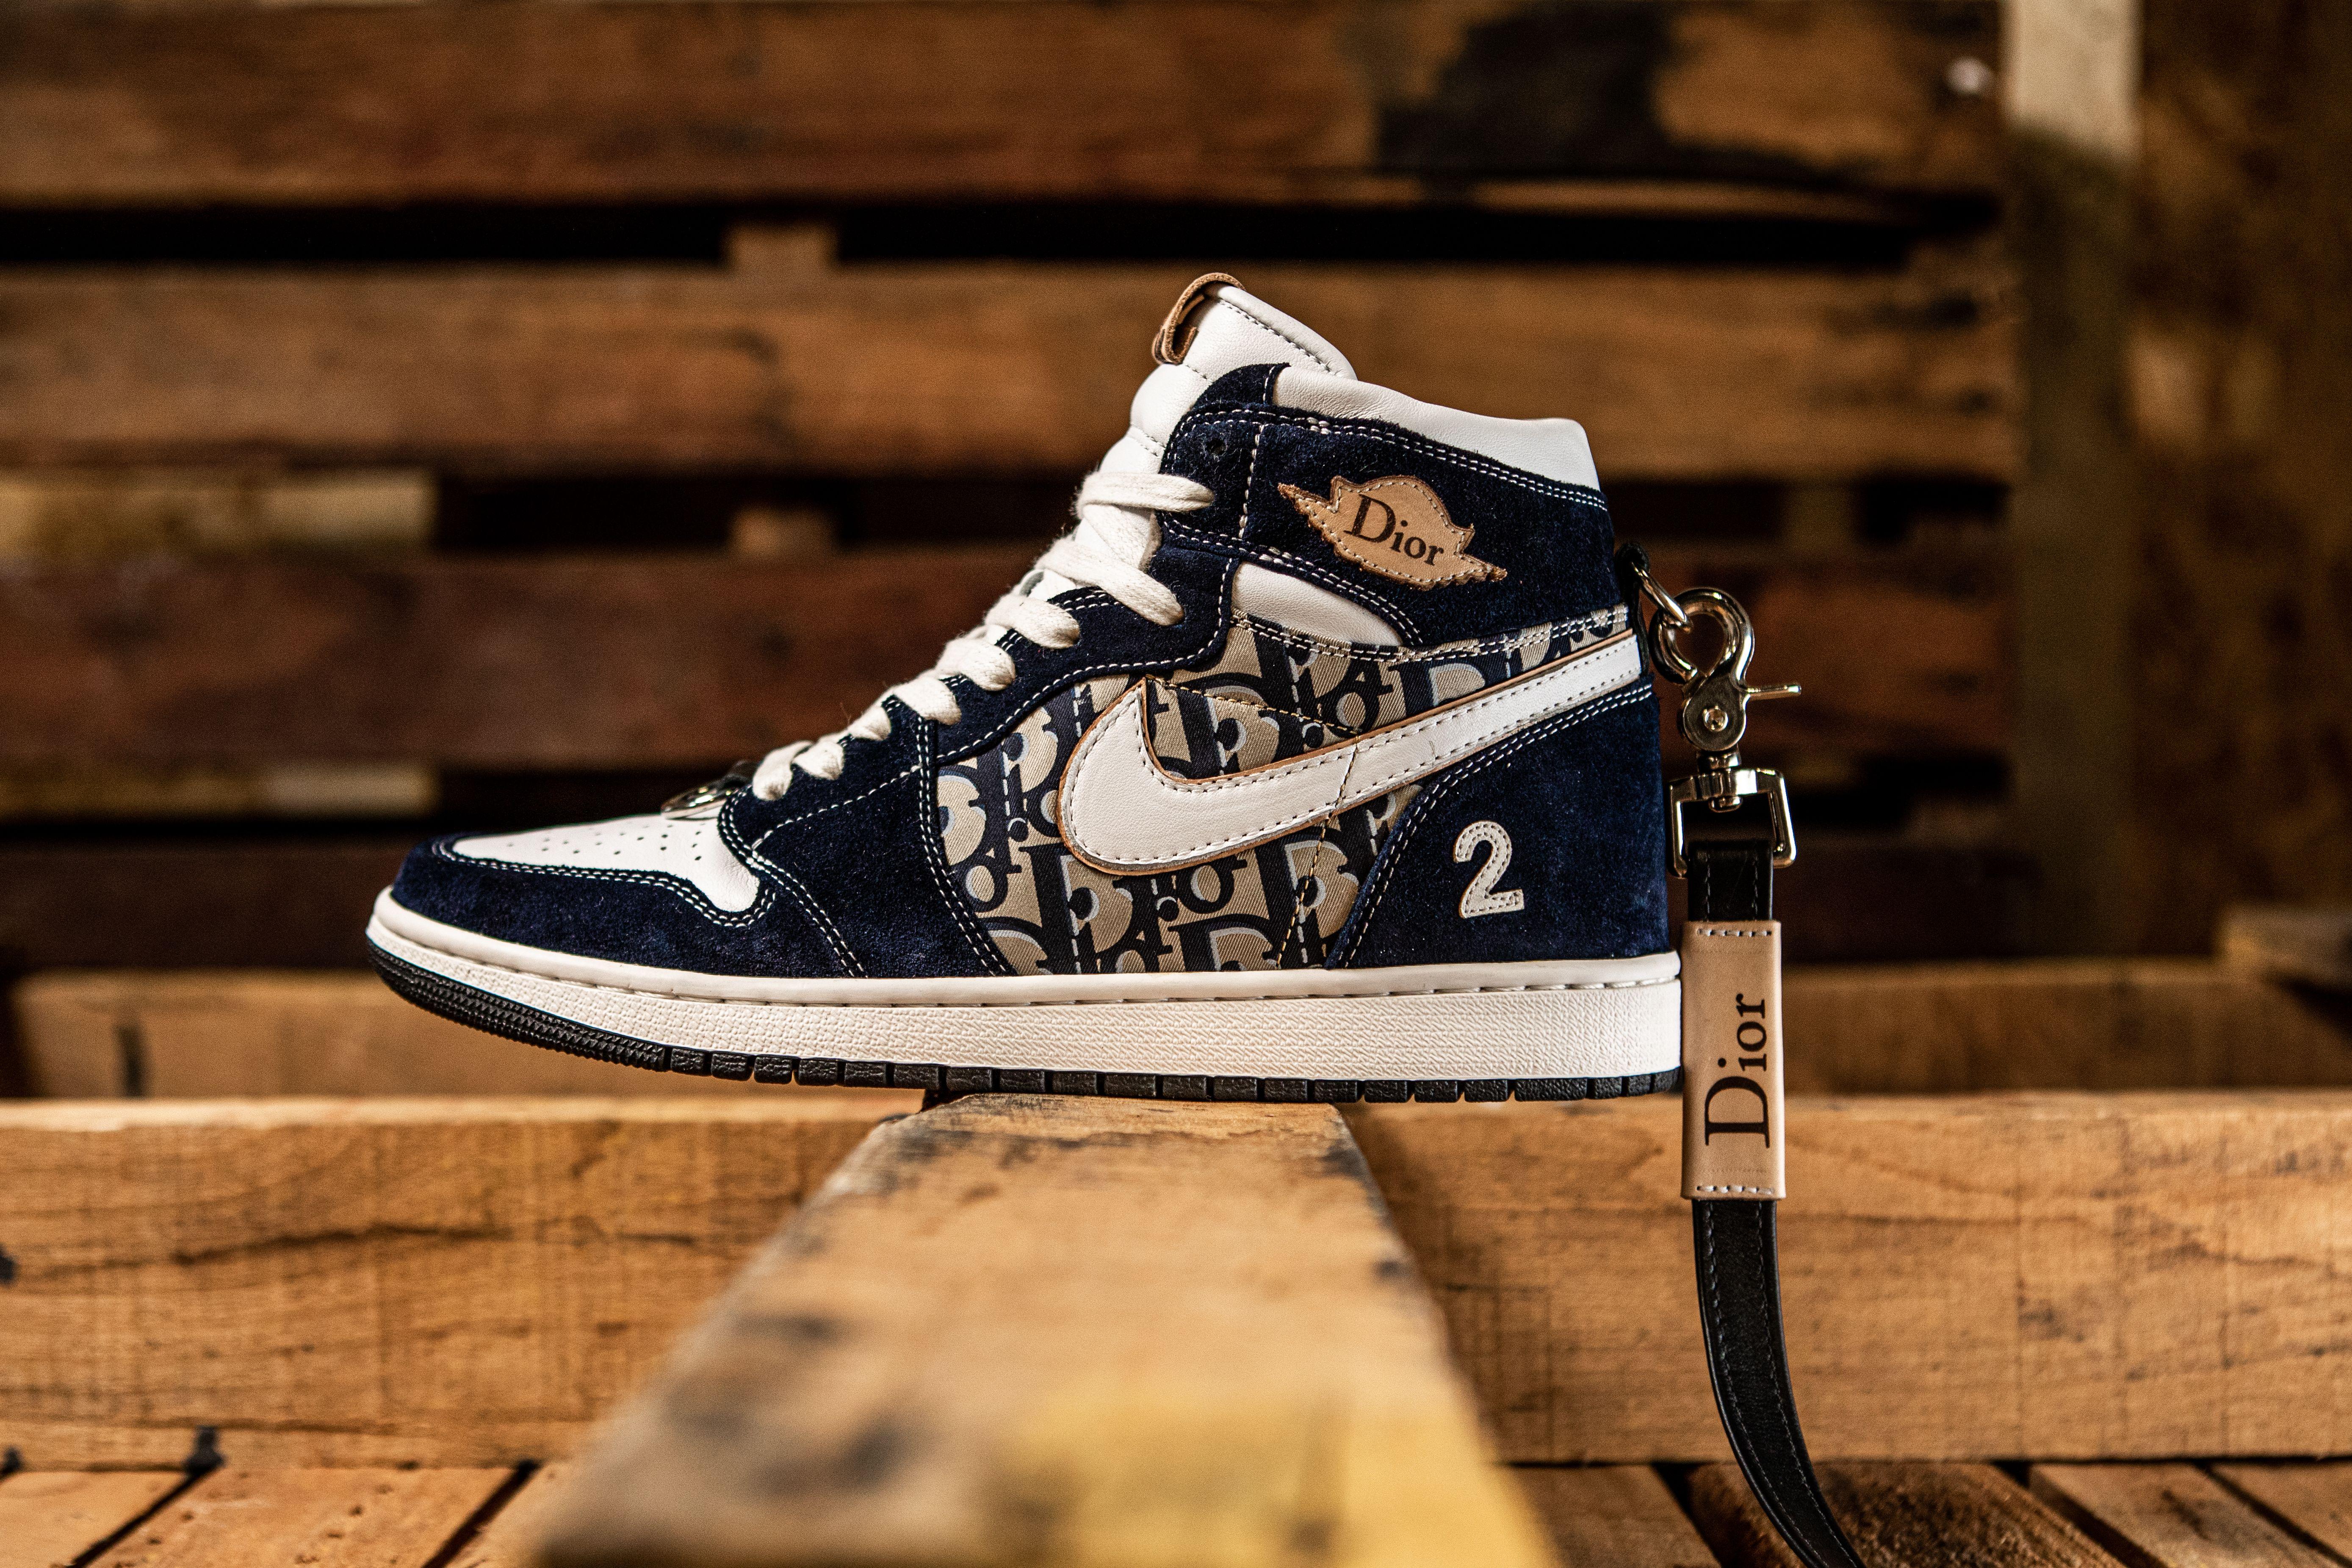 BespokeIND Nike Air Jordan 1 SB Dunk Dior Left